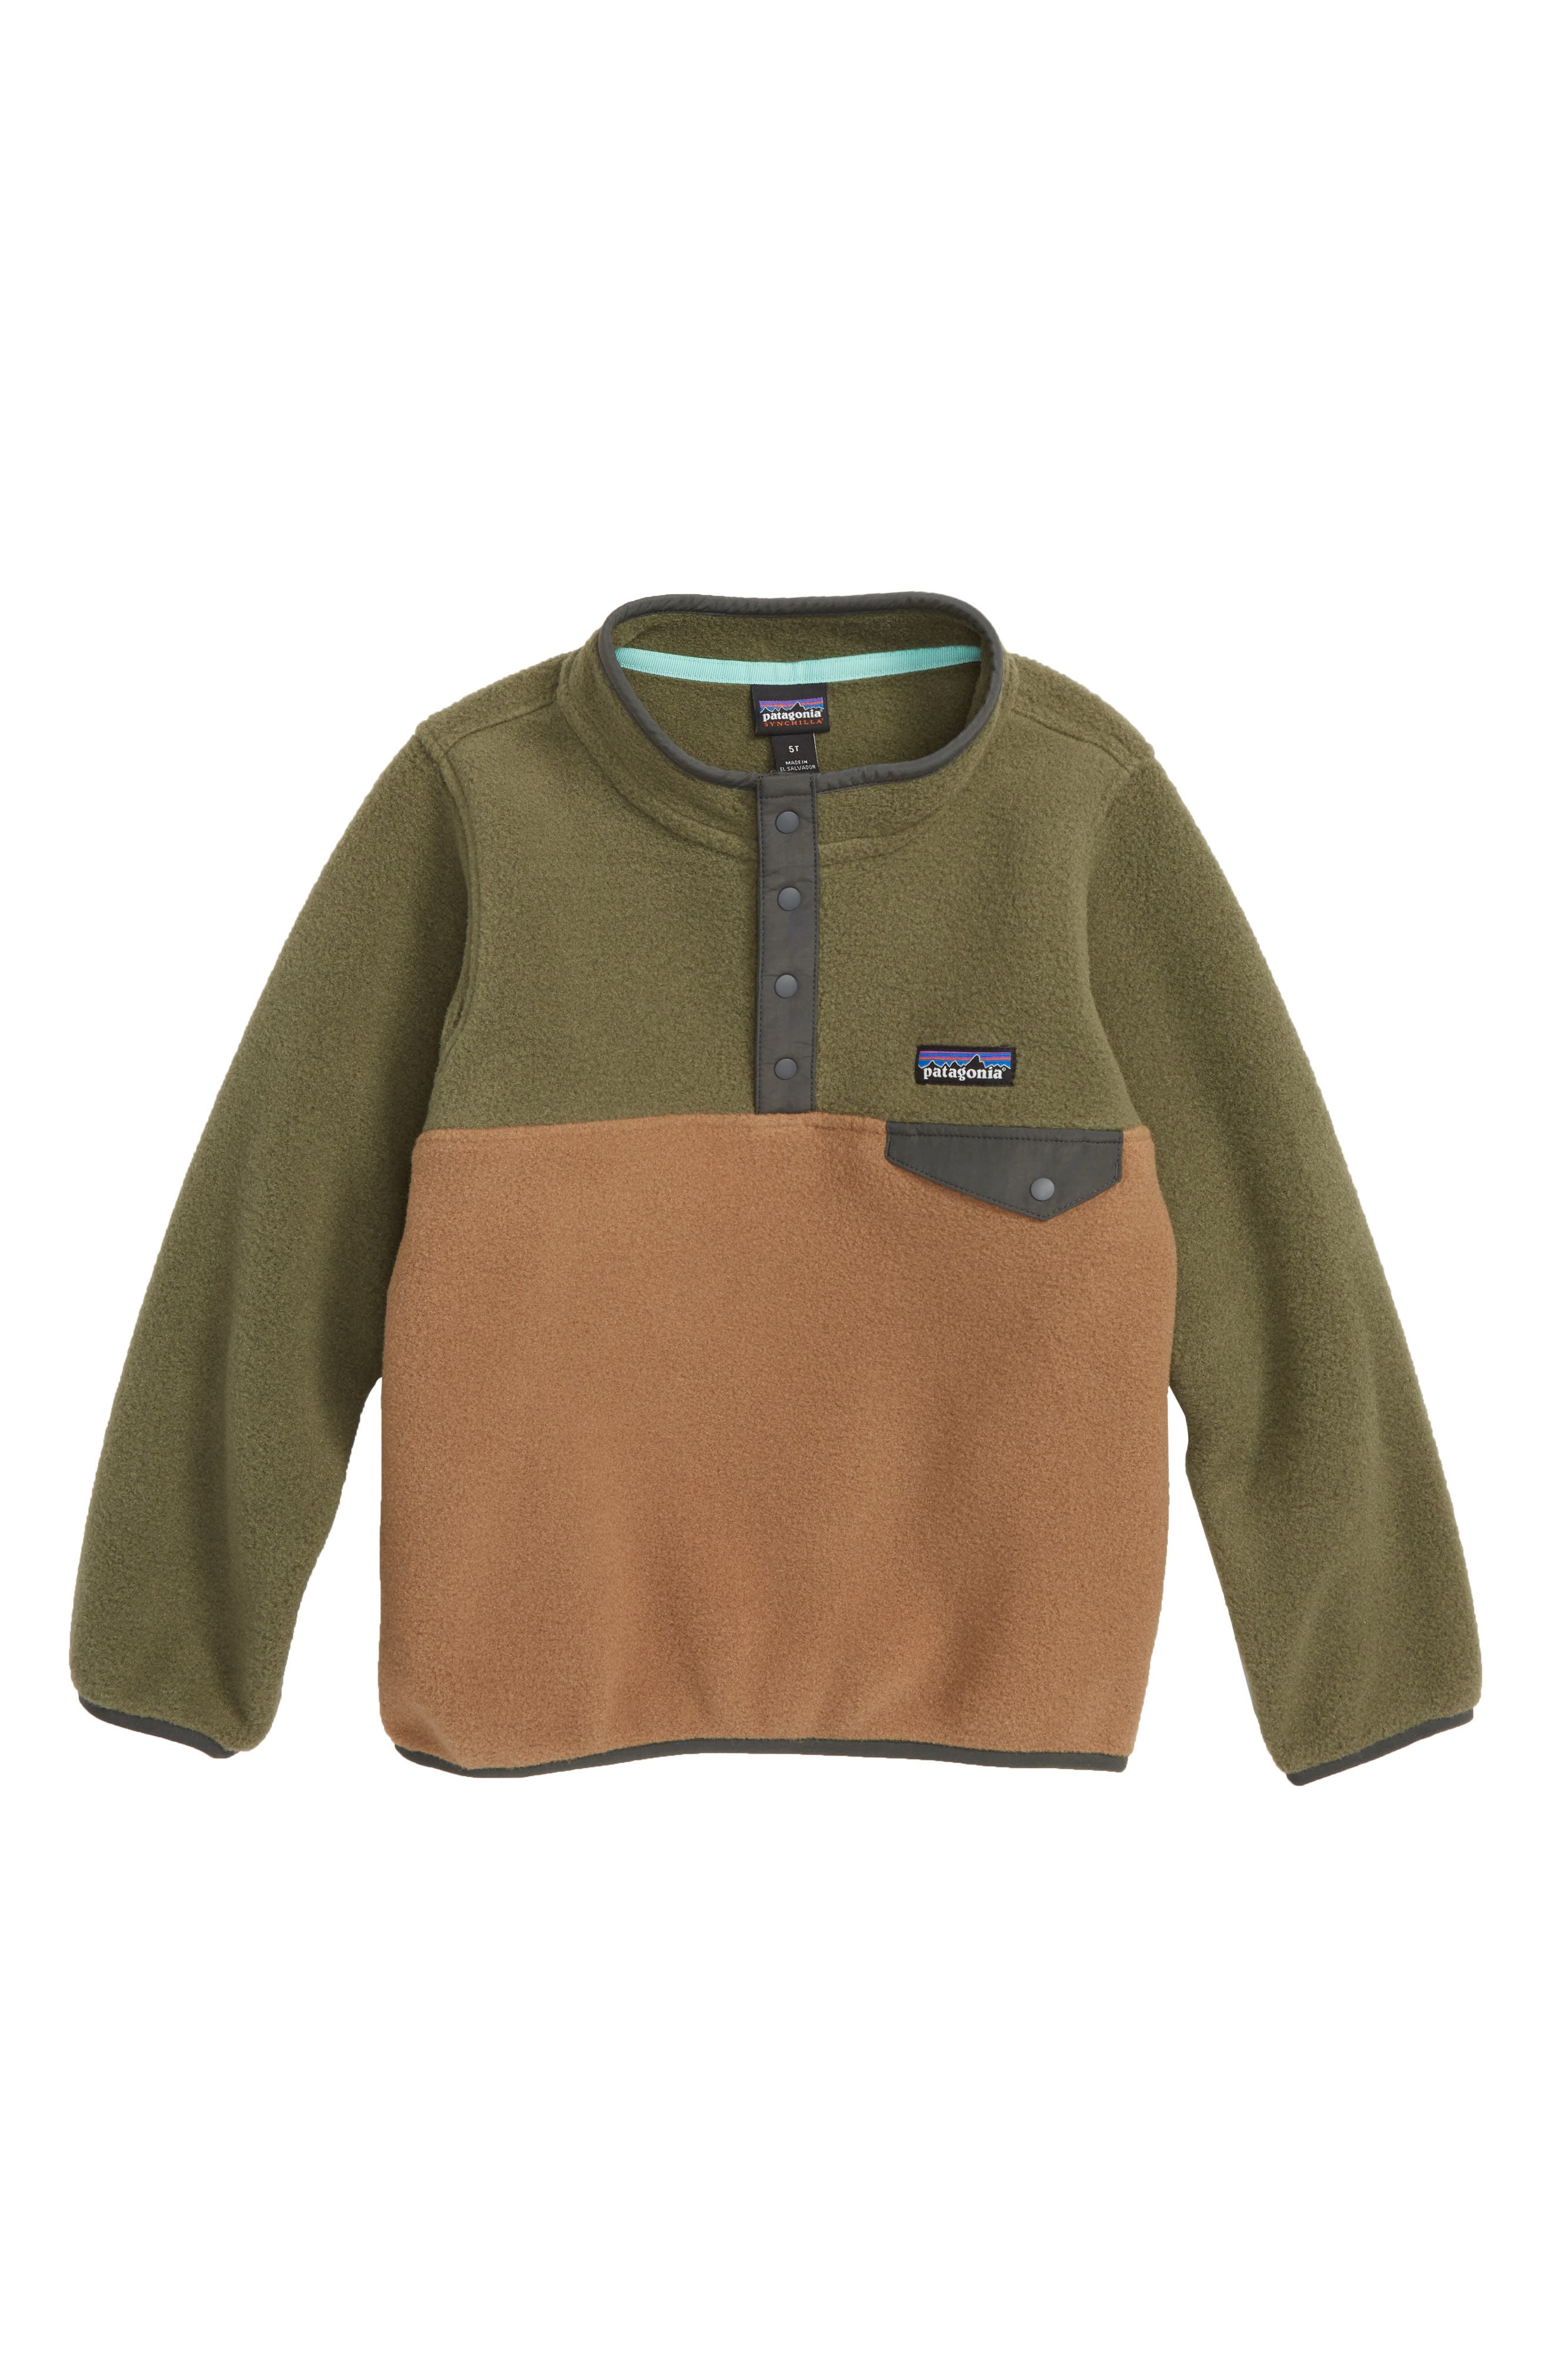 Synchilla<sup>®</sup> Snap-T<sup>®</sup> Fleece Pullover,                             Main thumbnail 1, color,                             Coriander Brown